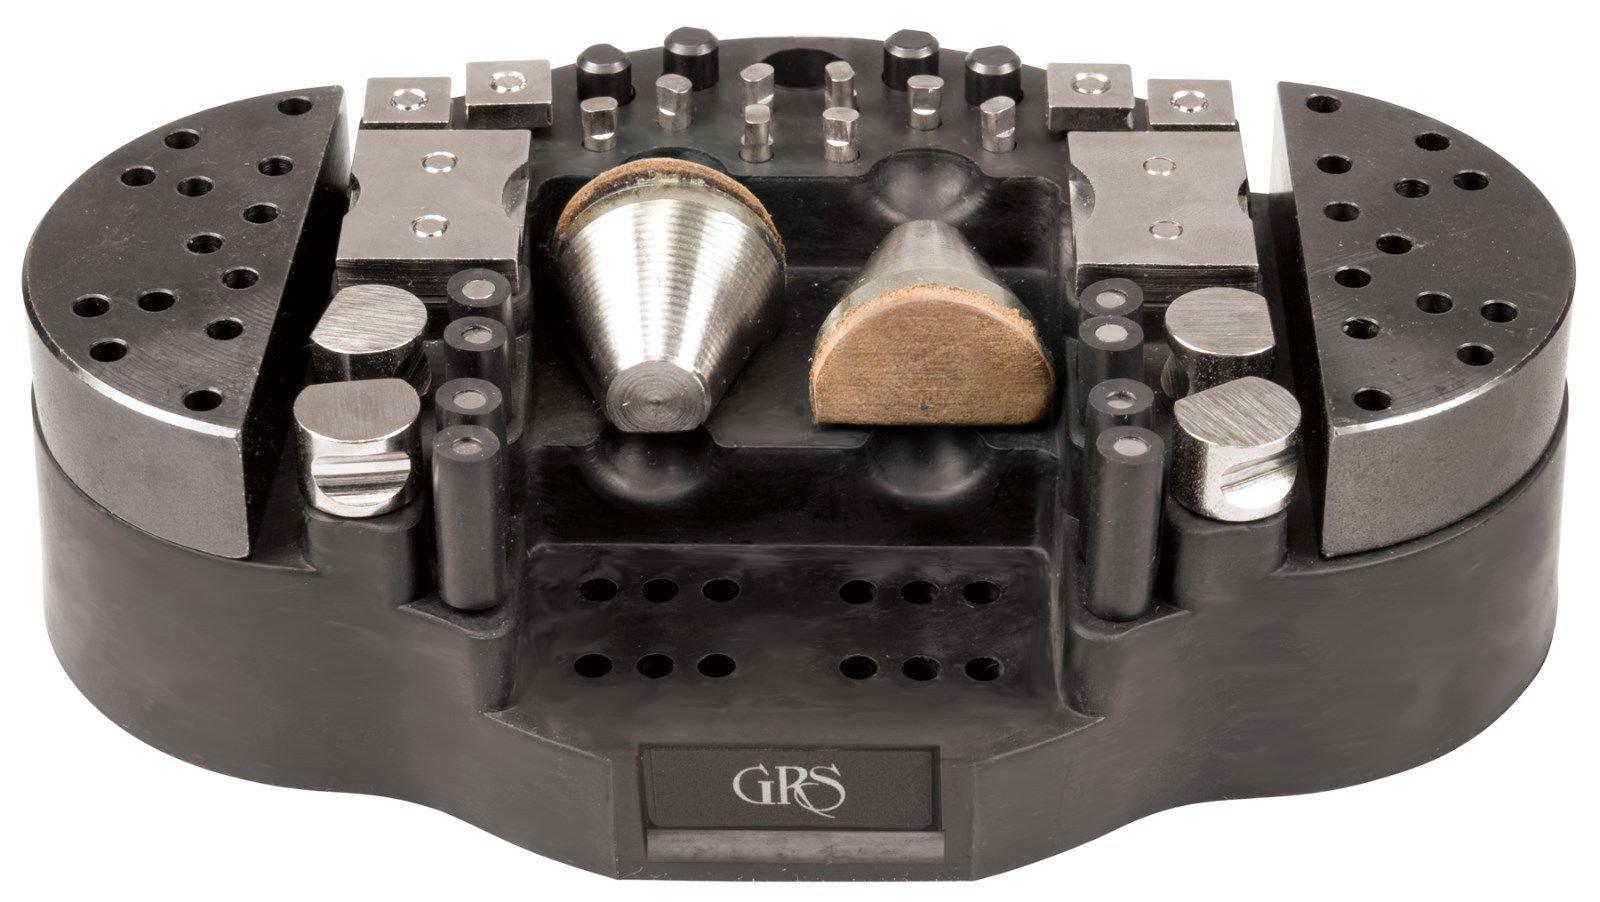 GRS® Tools 003-520MPV Attachment Set of 30 for Multi-Purpose Vise